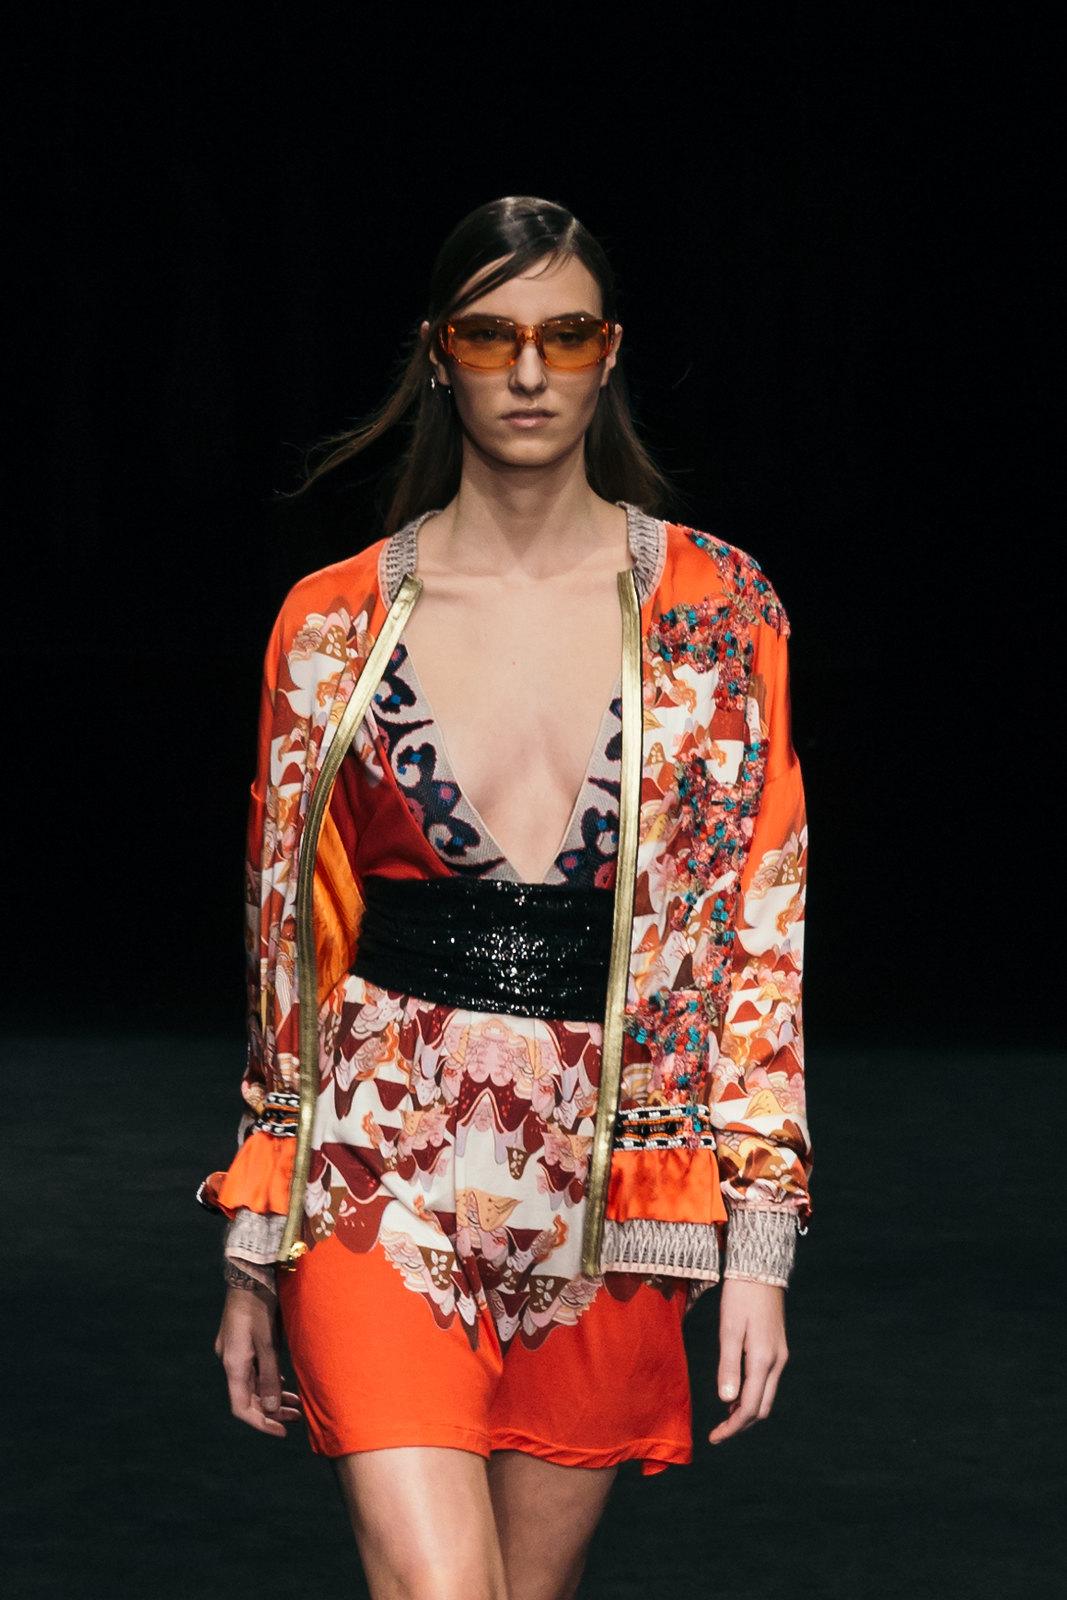 Jessie Chanes - Seams for a desire - 080 Bacelona Fashion #080bcnfasion -12